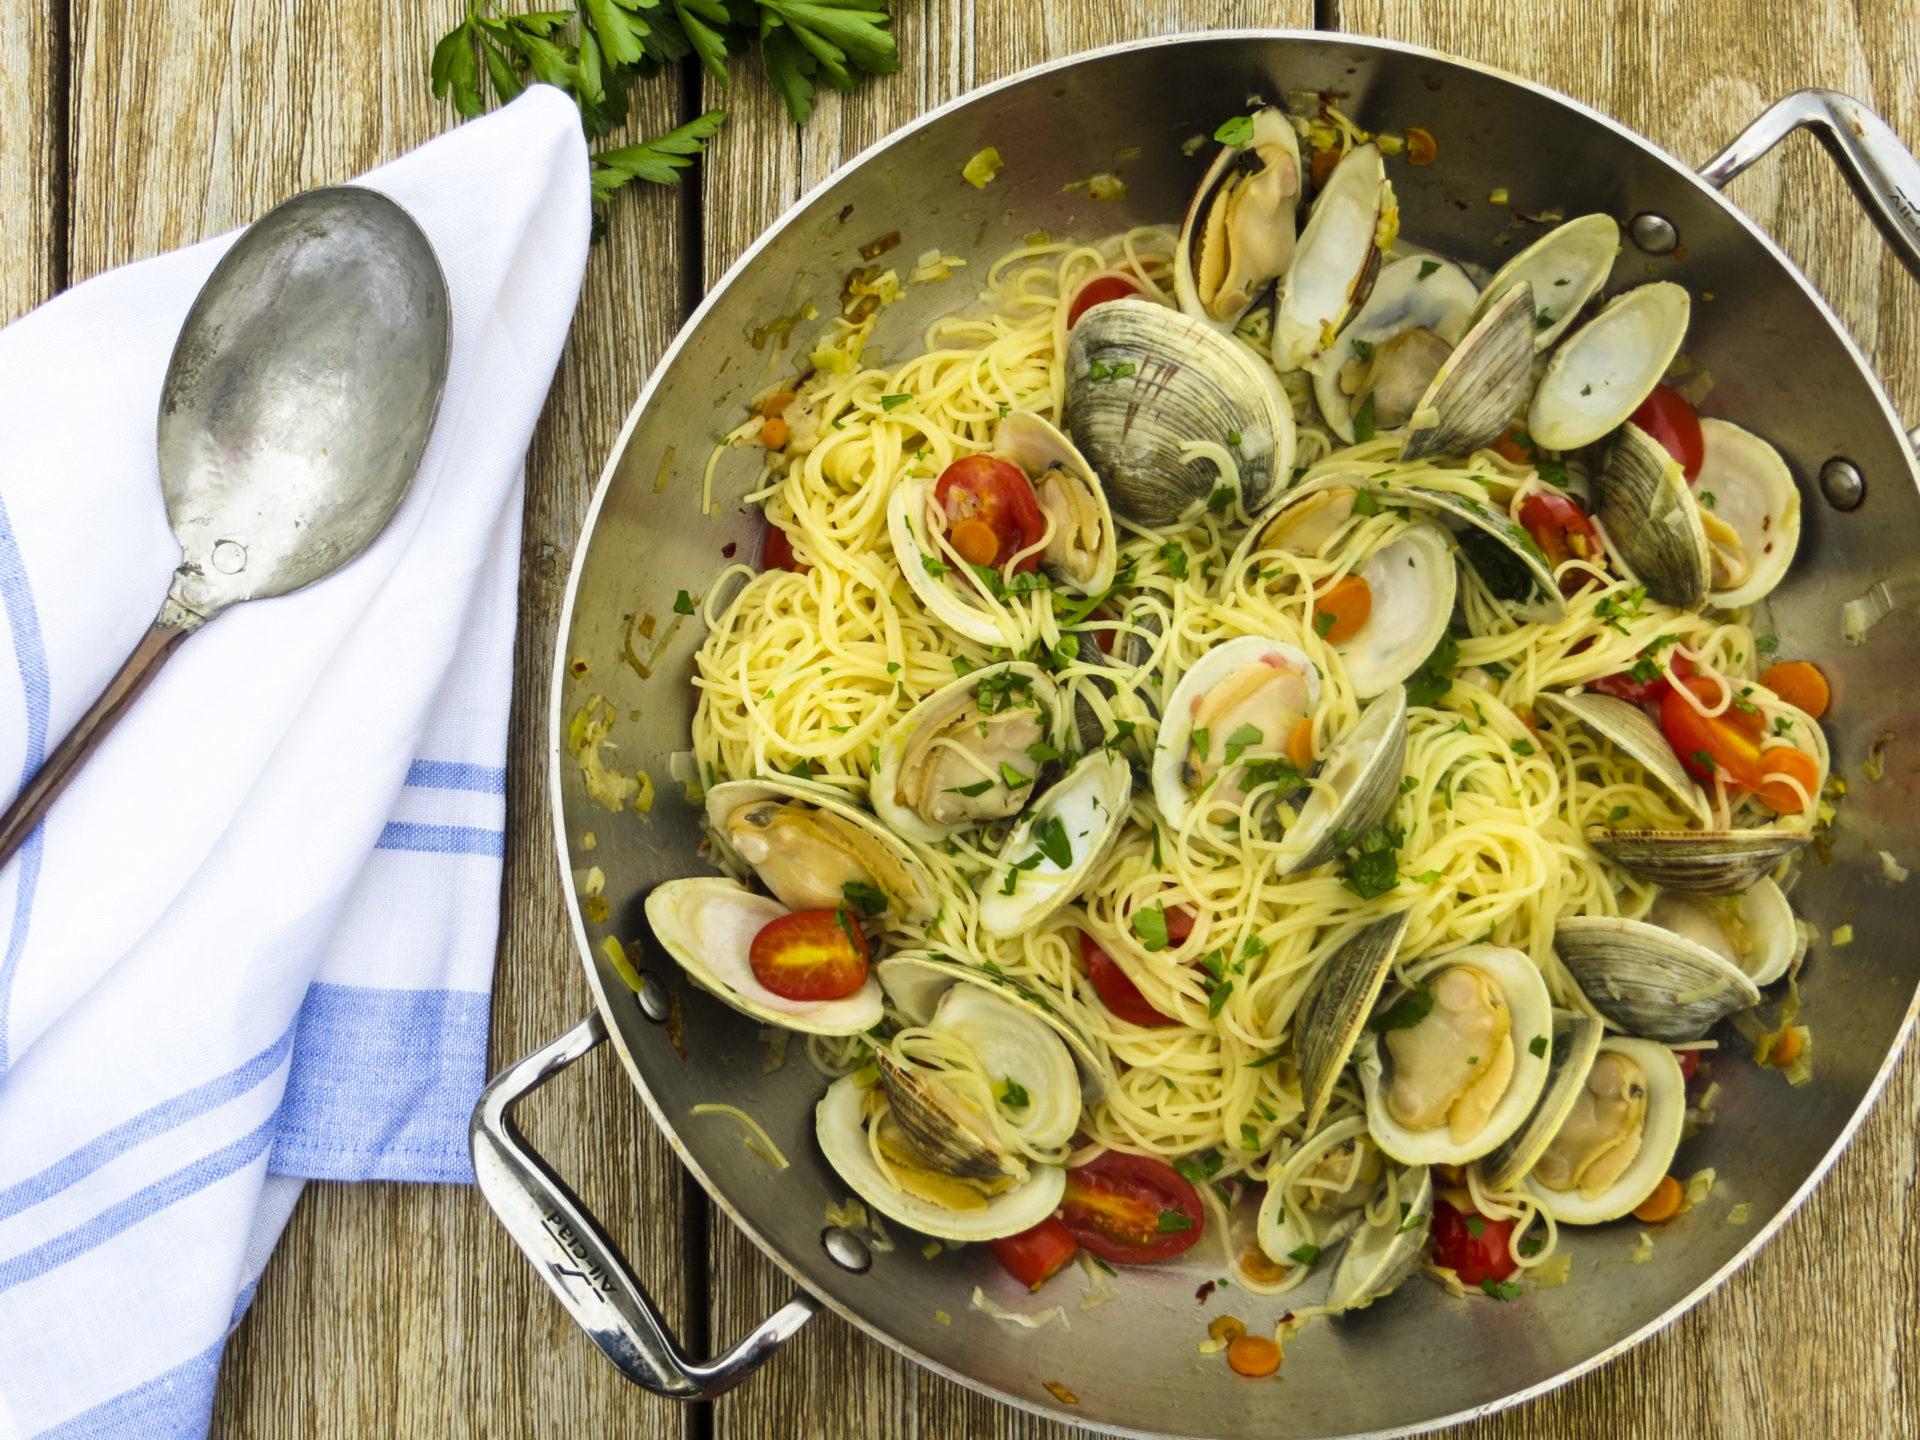 La Cucina Italiana and Learning Italian Recipe by Recipe  Our Italian Table